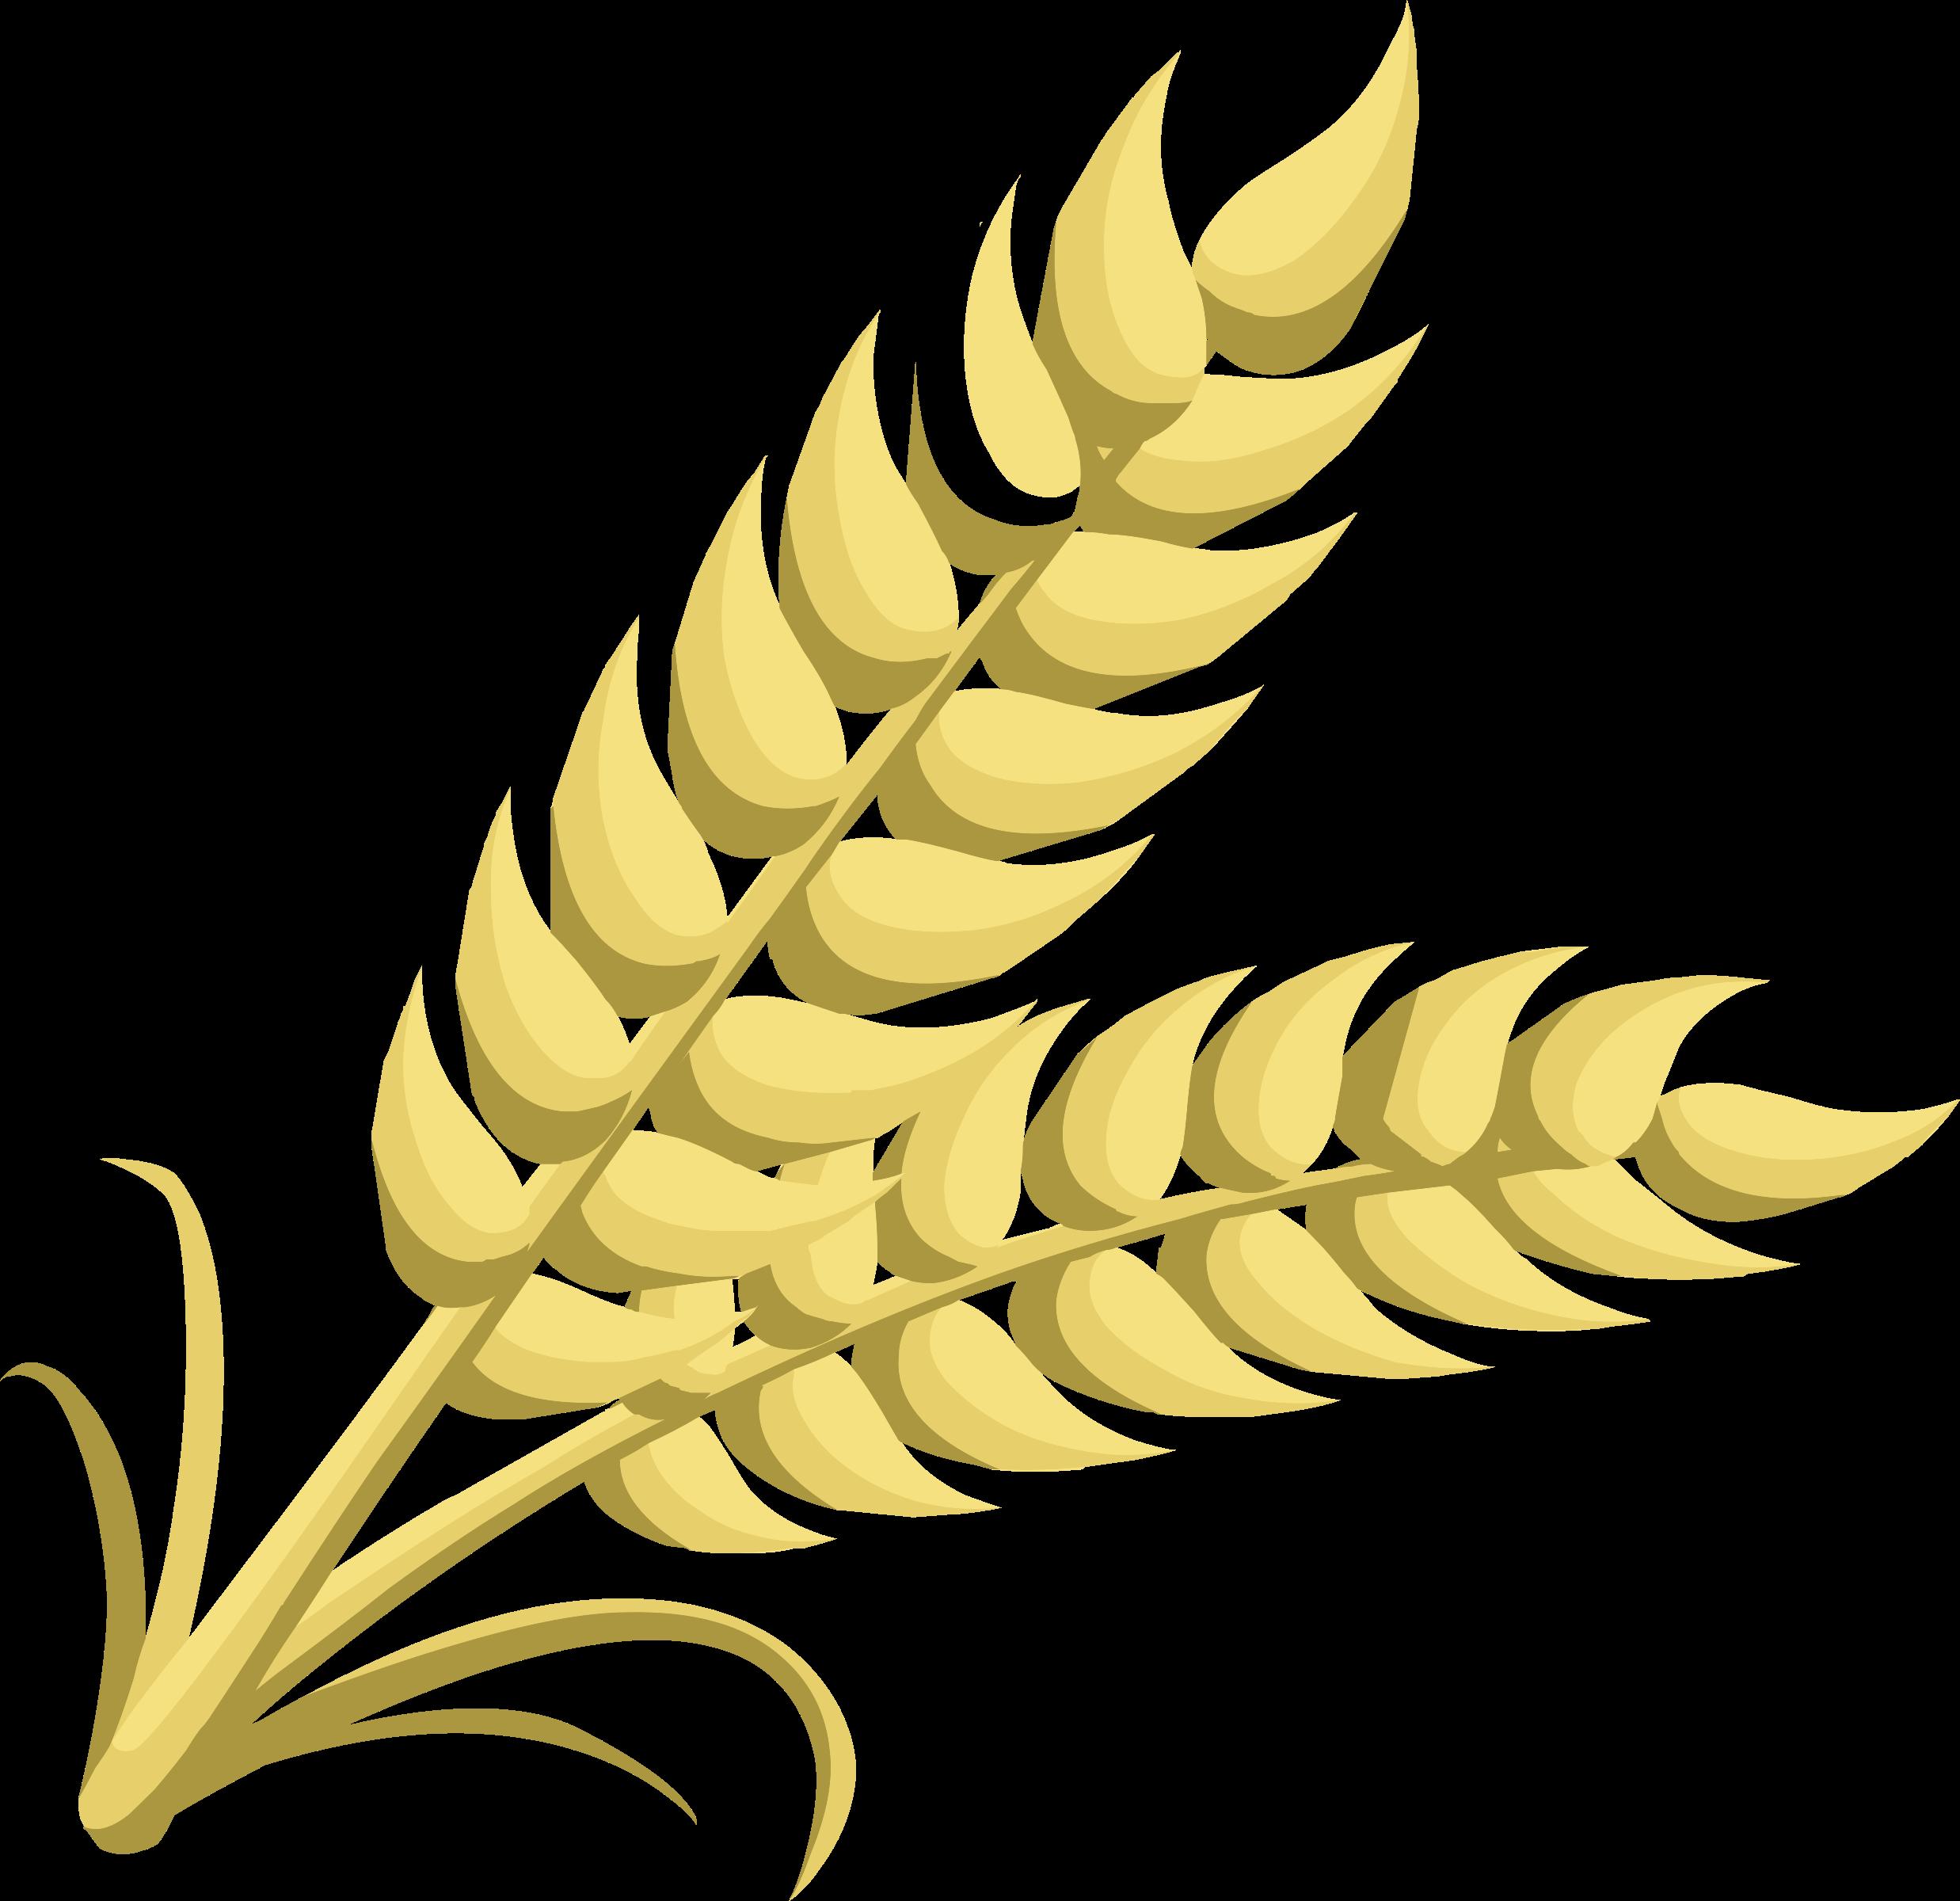 Grain clipart transparent background wheat. Pin by veniecesha woodall